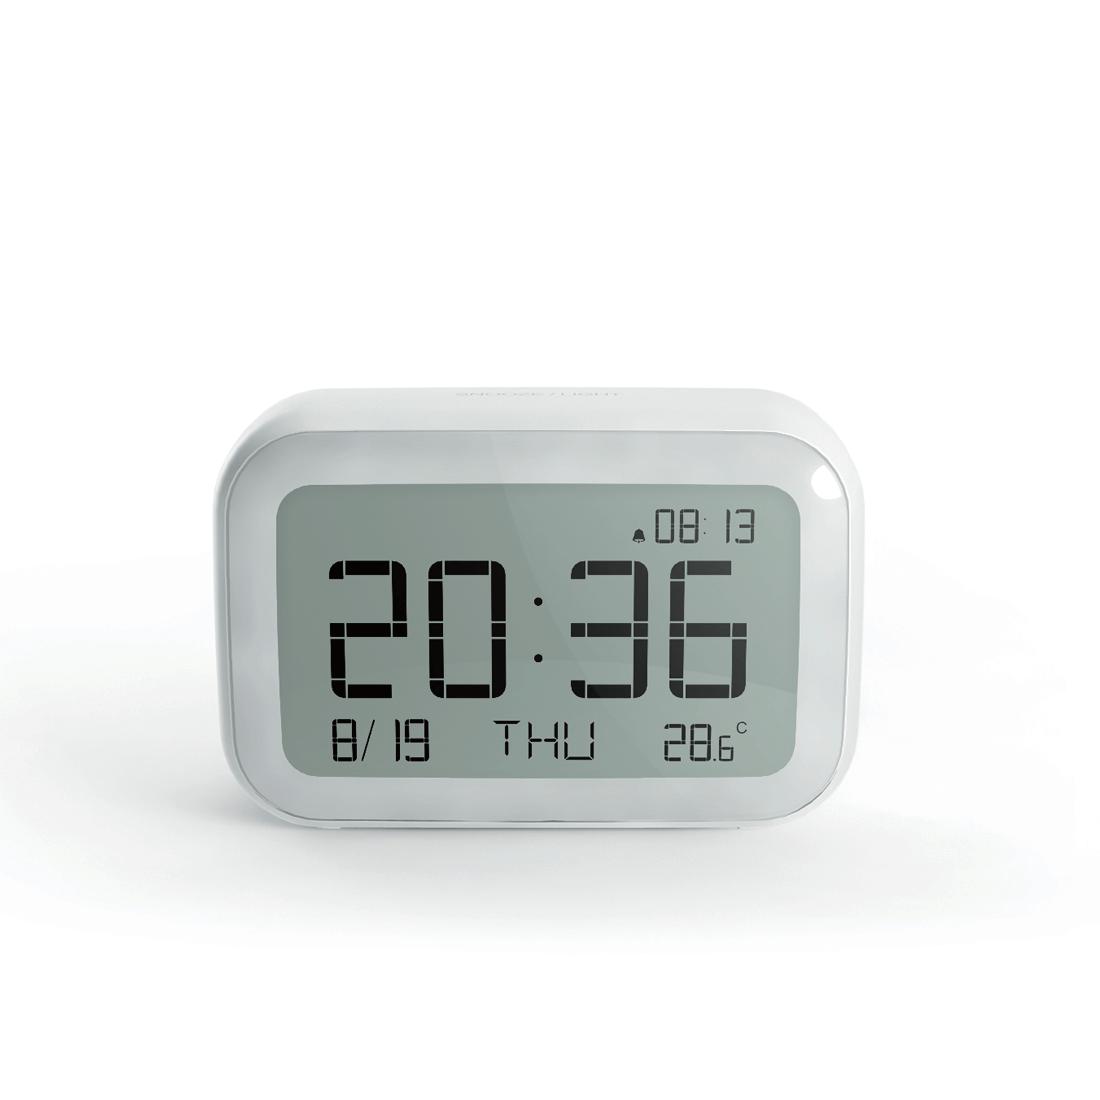 wireless weather station digital alarm clock air quality. Black Bedroom Furniture Sets. Home Design Ideas